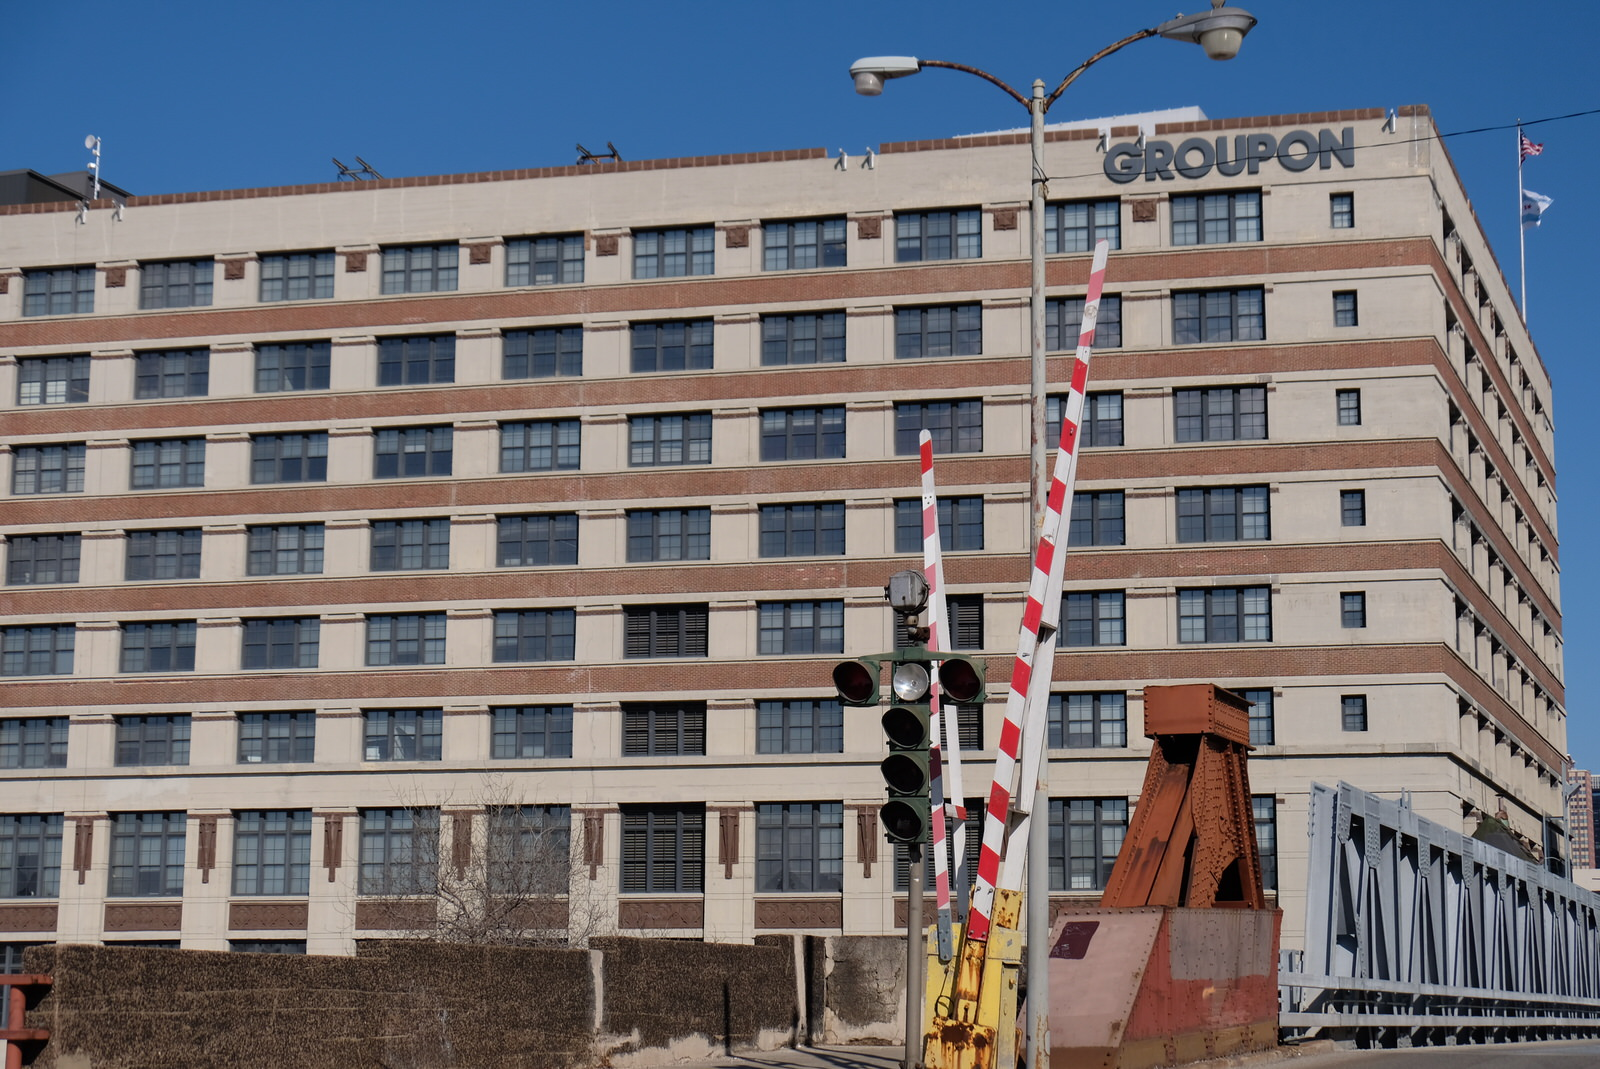 Groupon's corporate headquarters in Chicago, Illinois.